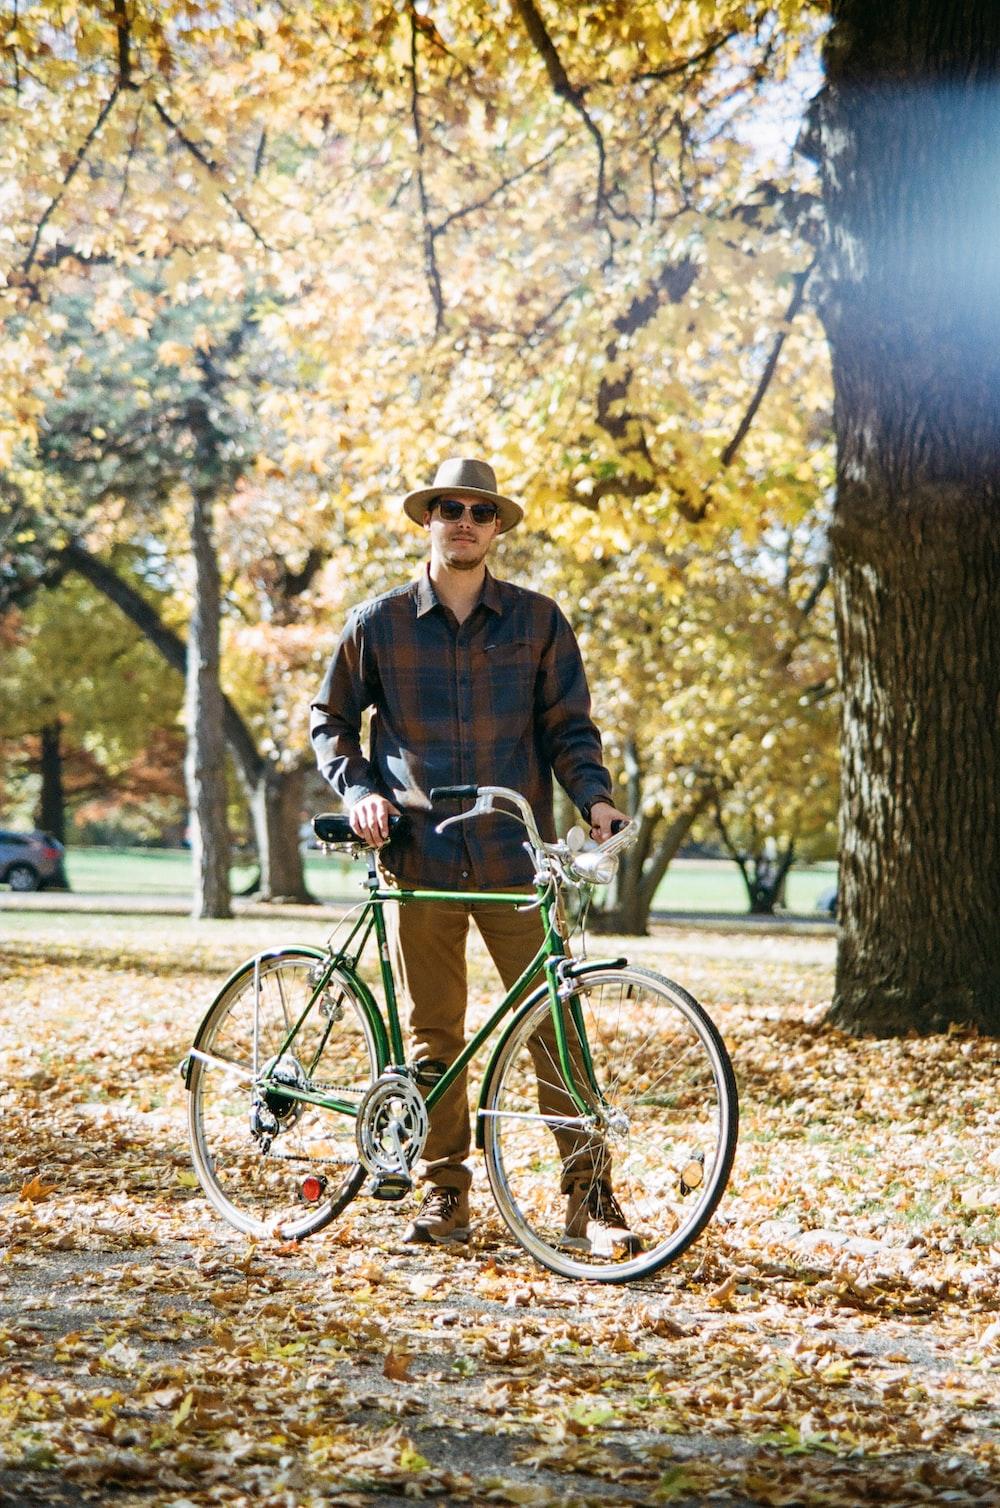 man in black jacket riding on bicycle